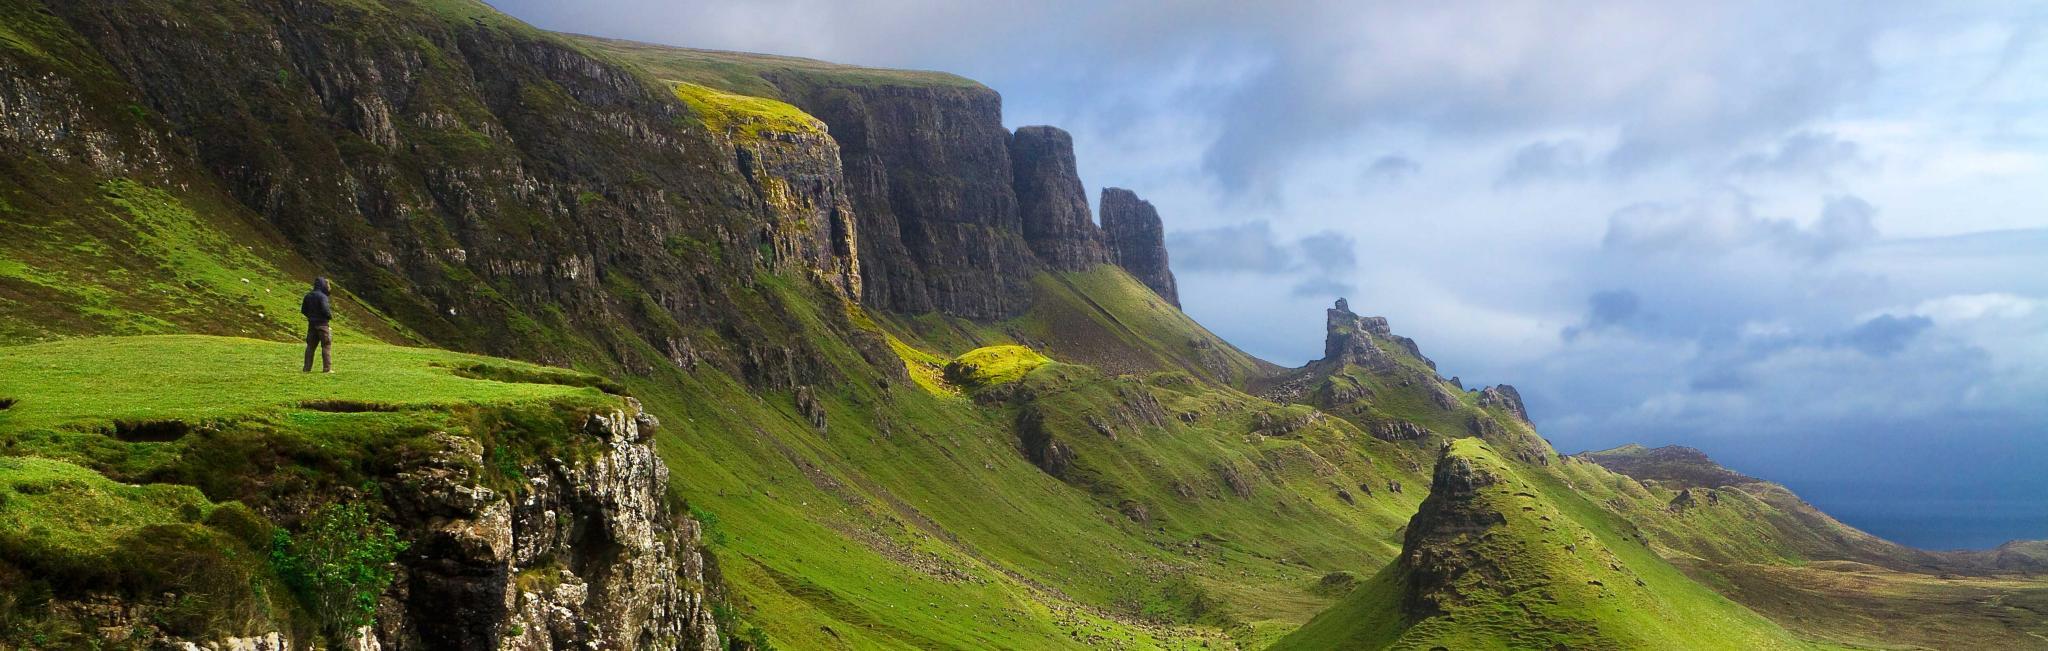 highlands2.jpg